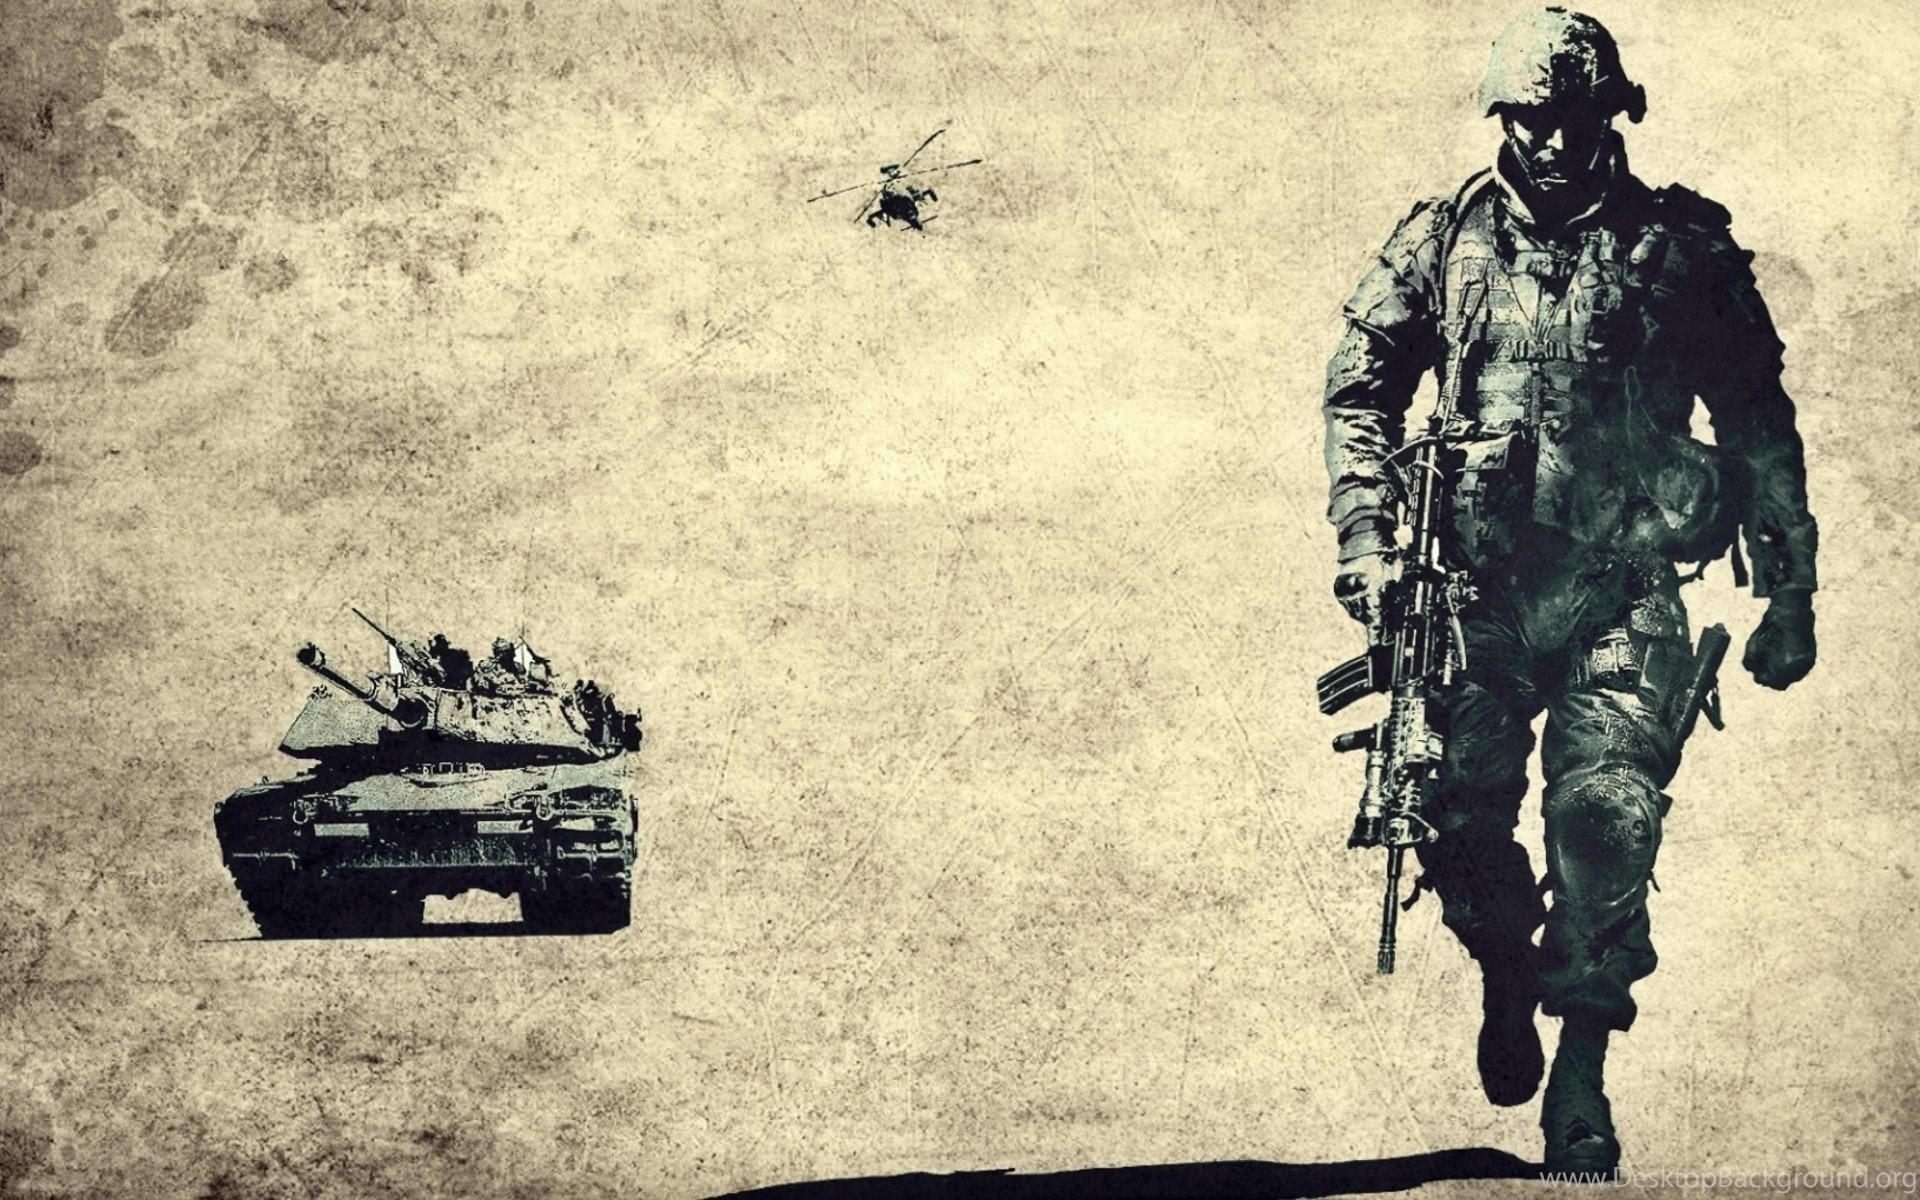 Army Airborne Ranger Wallpaper 1